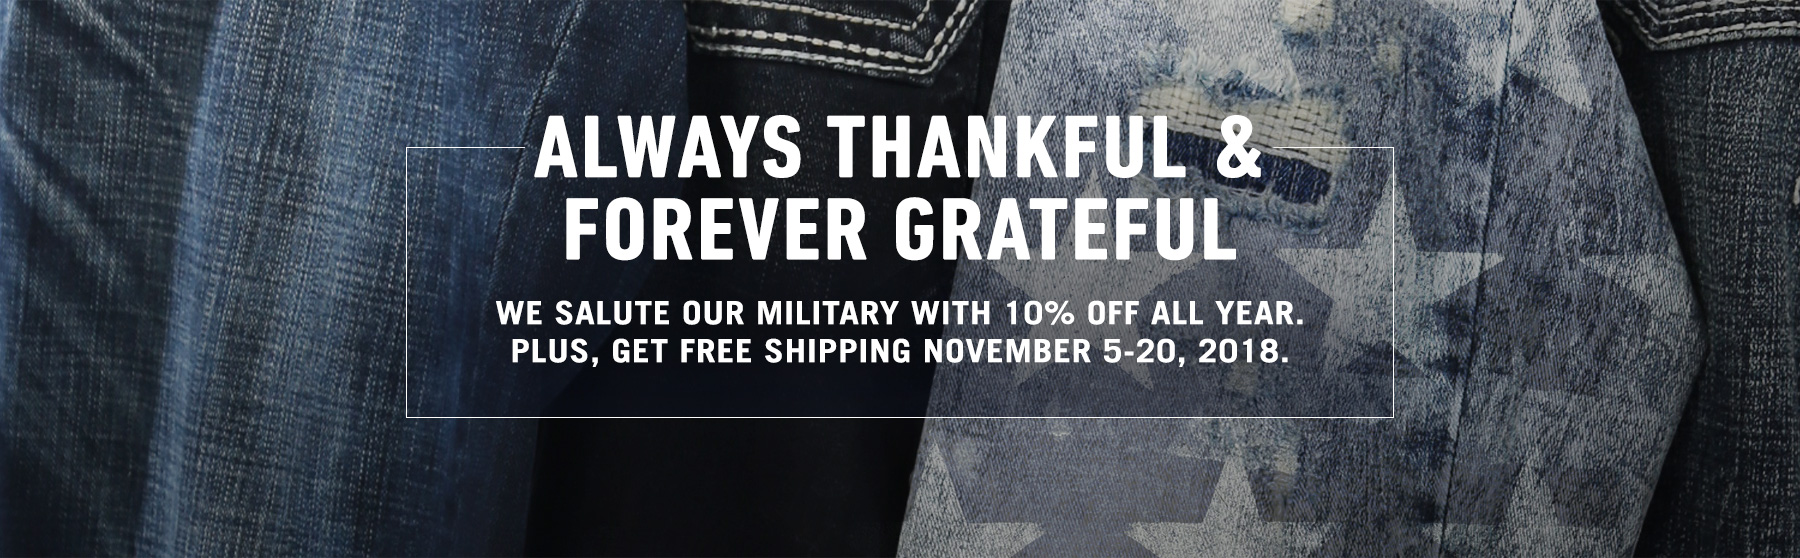 Verified Military Accounts get Free Shipping at Buckle. November 5-20, 2018.